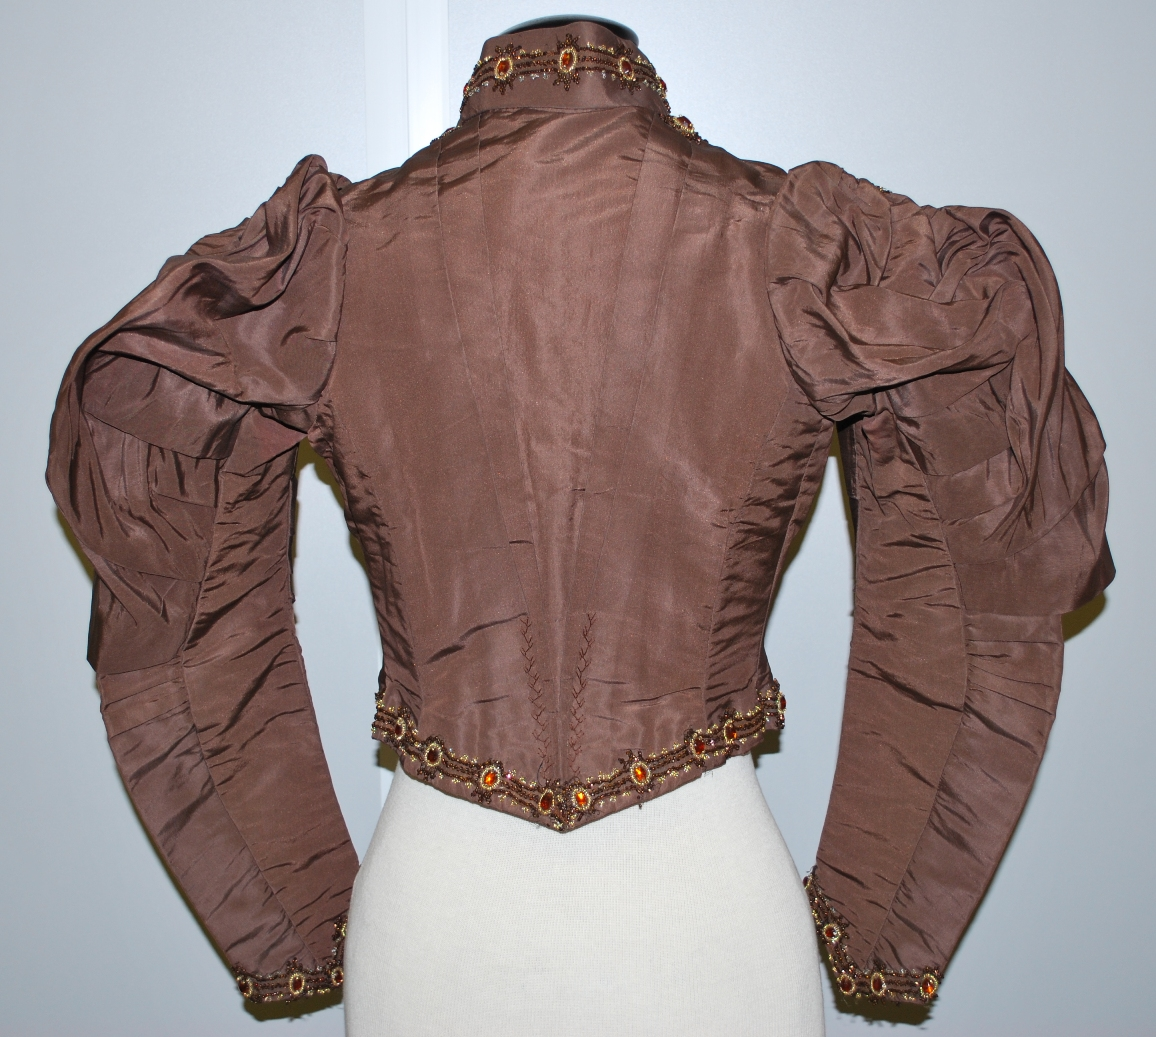 Back of wedding suit jacket c.1880s